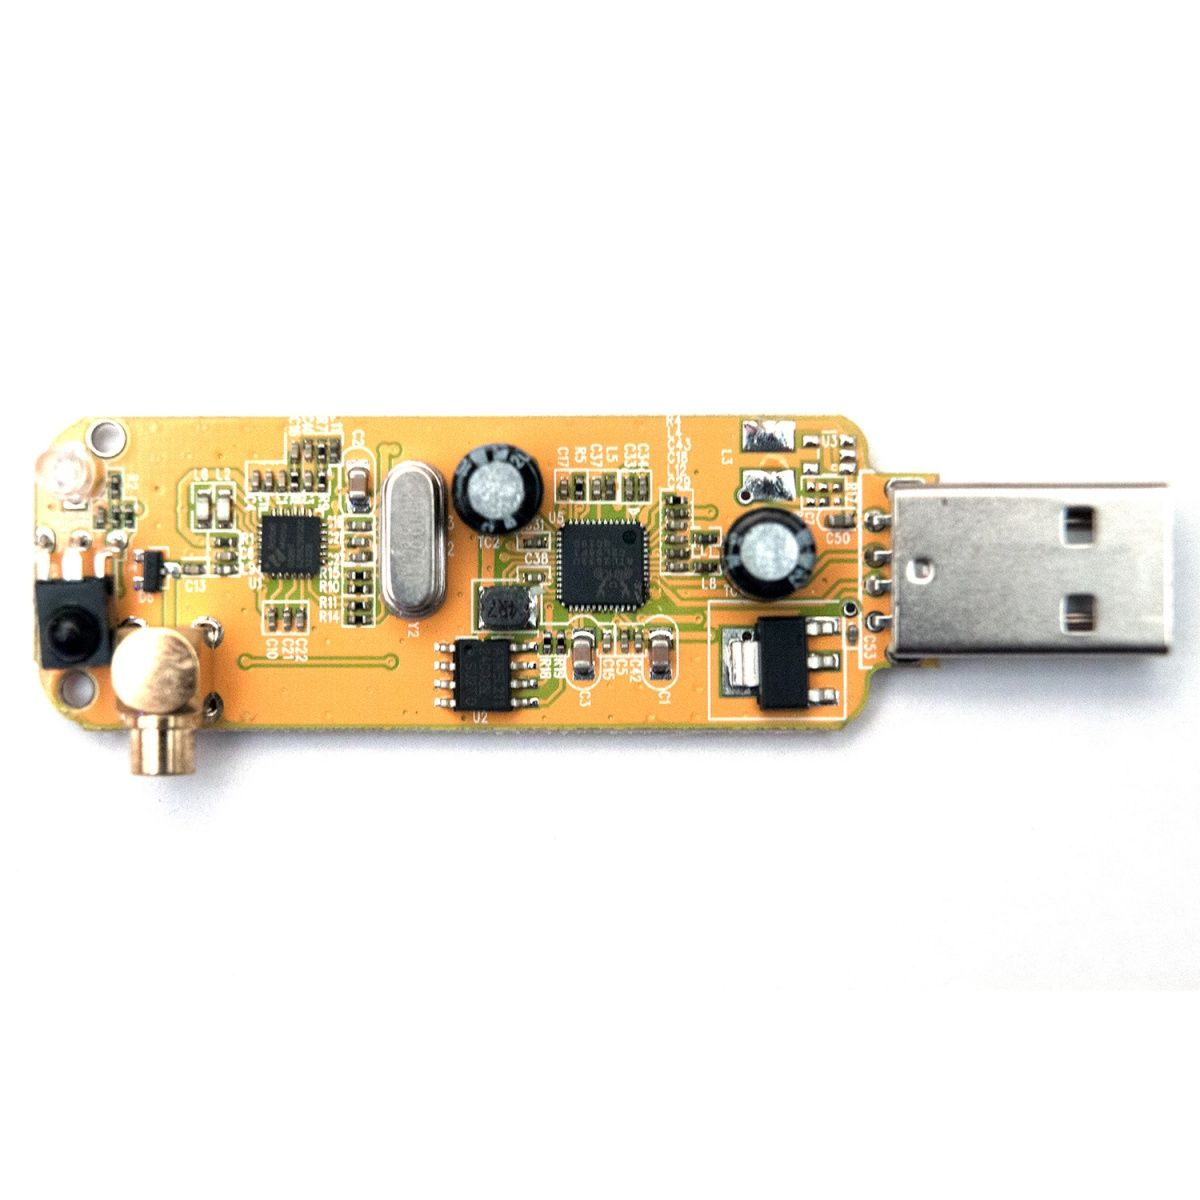 NESDR Mini+ Al - 0 5PPM TCXO USB RTL-SDR Receiver (RTL2832 + R820T